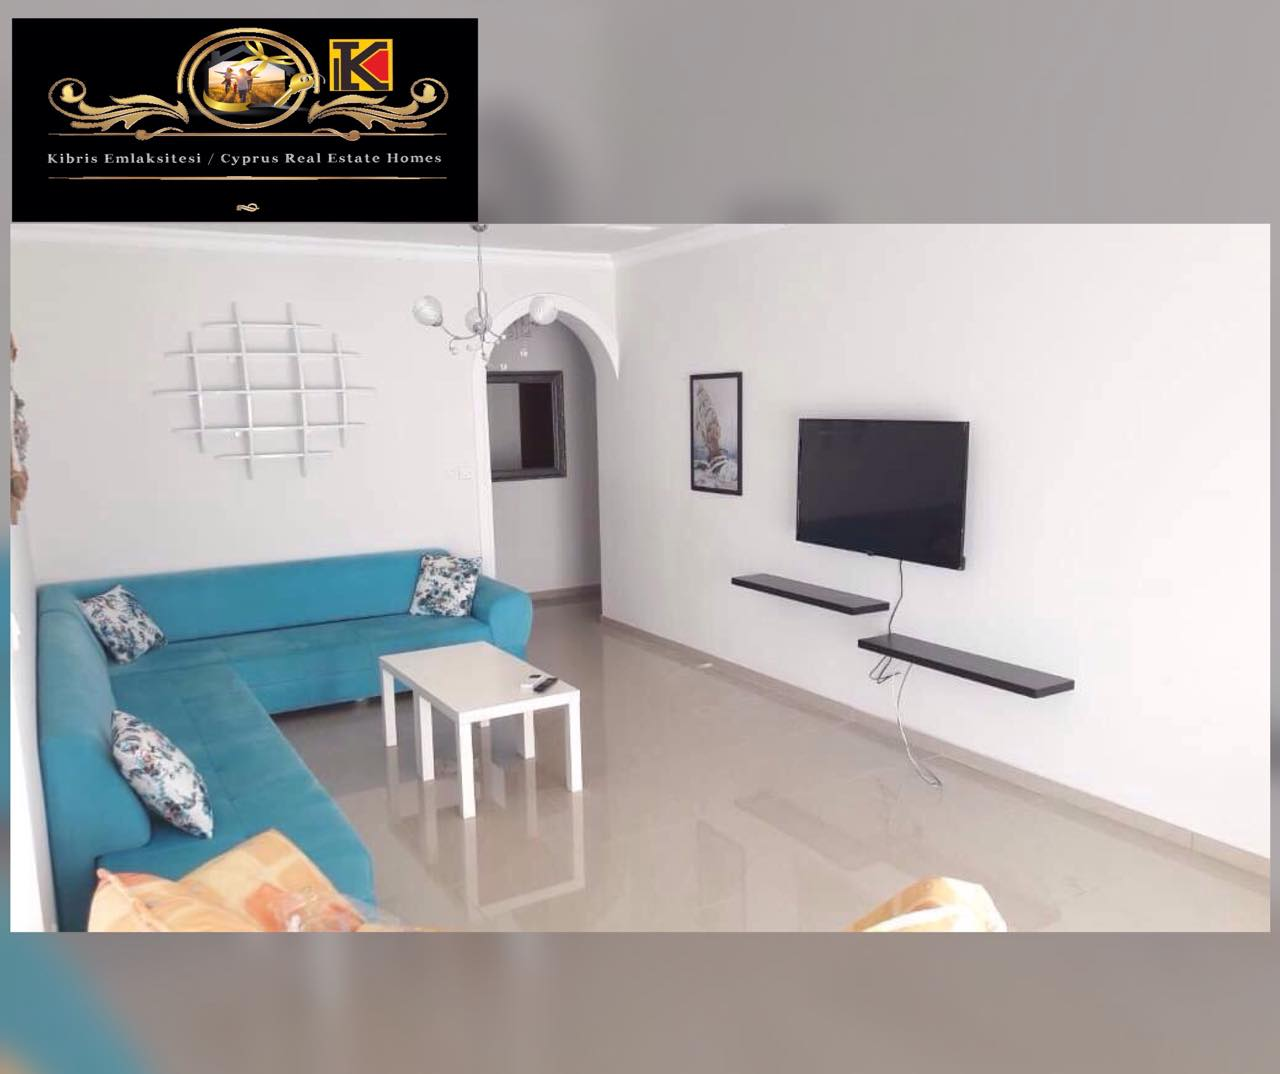 3 Bedroom Luxury Apartment For Rent Location Entrance Doğanköy Girne